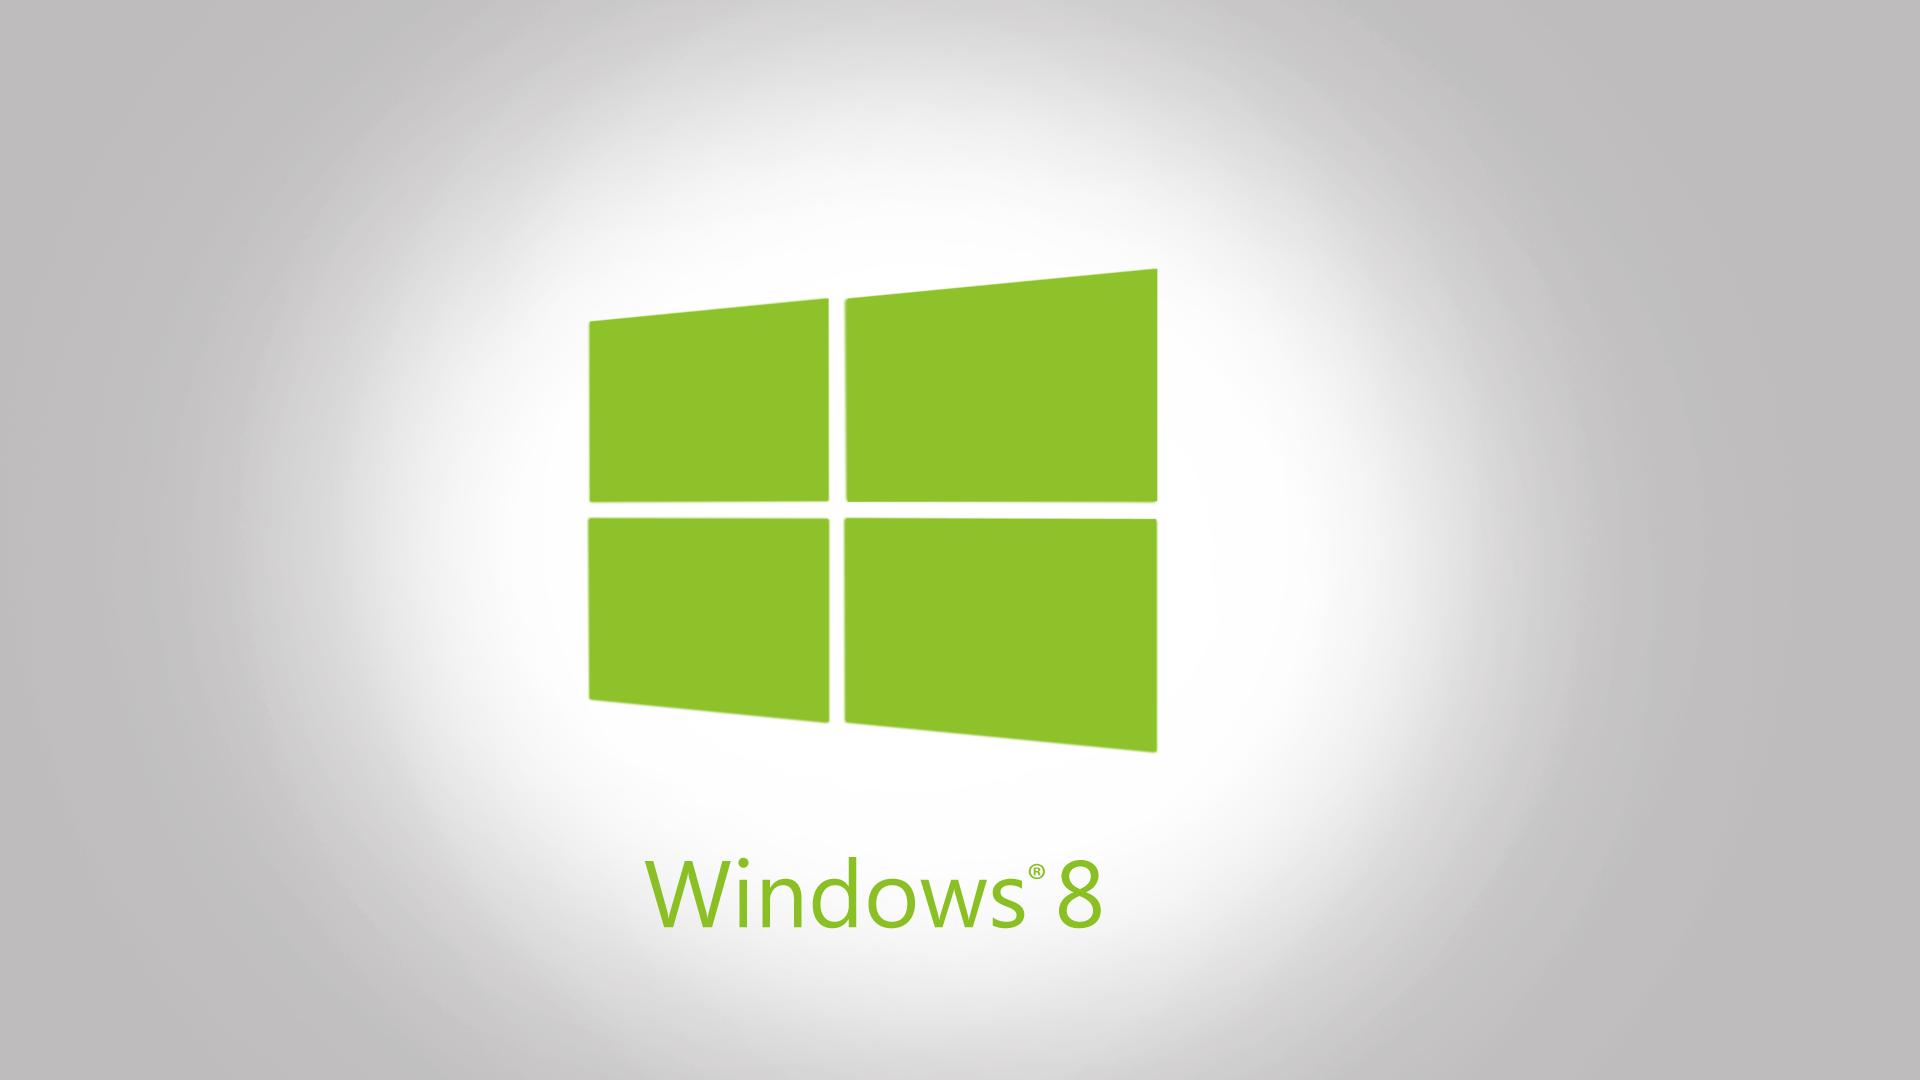 windows 8 logo wallpaper hd